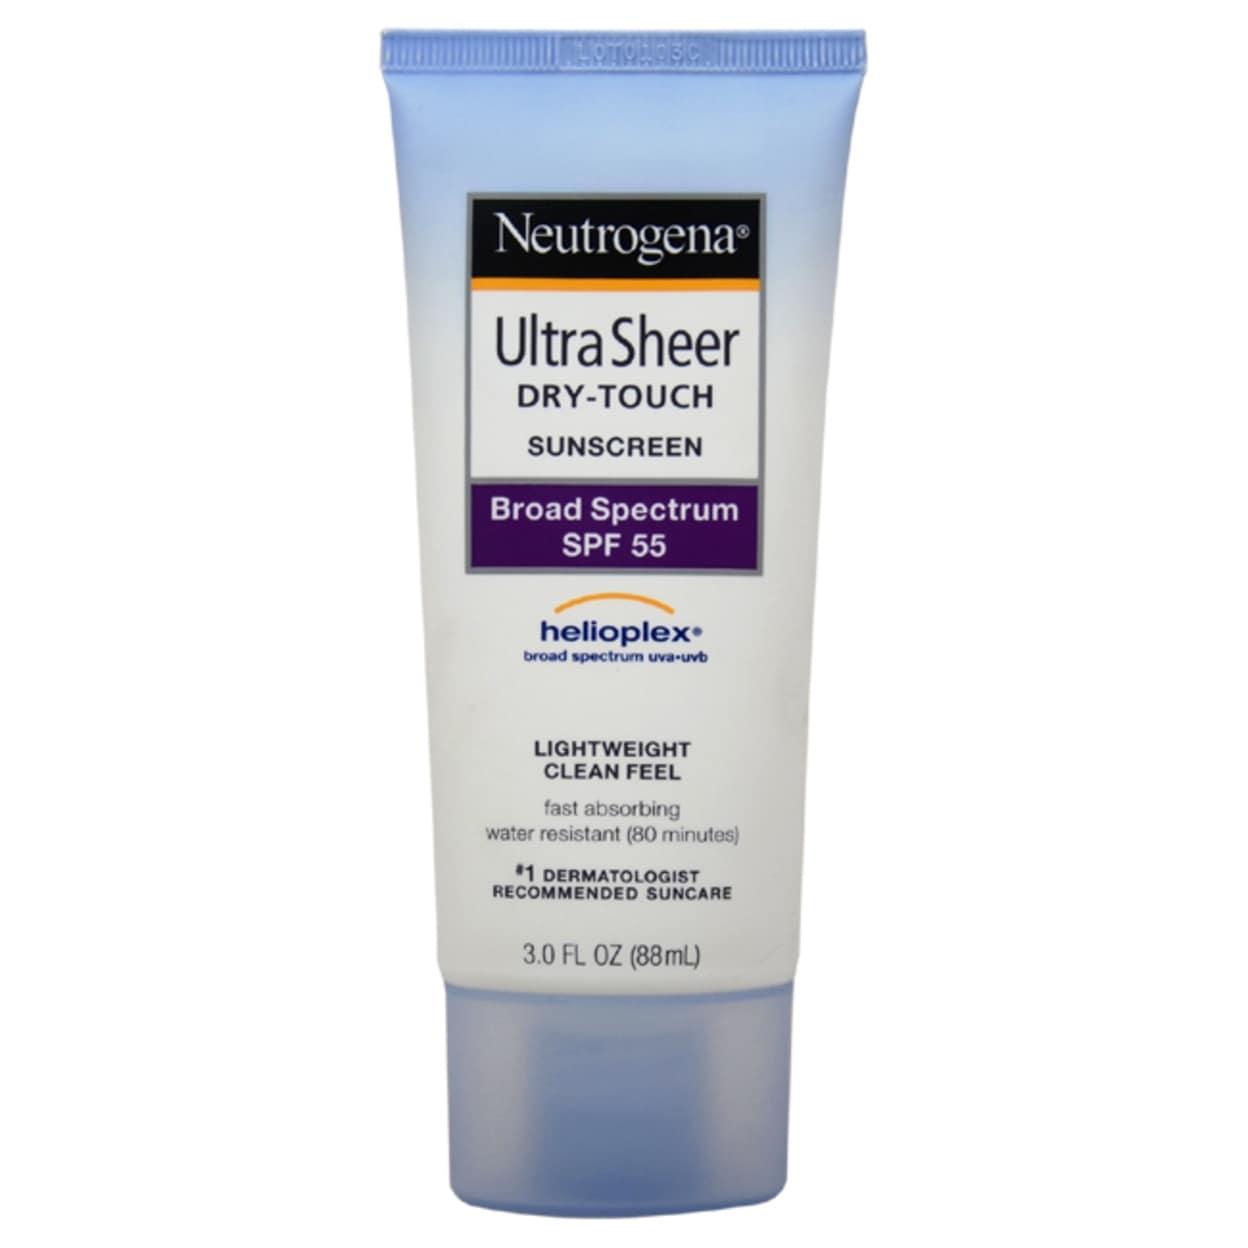 Neutrogena Ultra Sheer Dry-Touch Sunblock Spf-55 Sunscreen 3 Oz